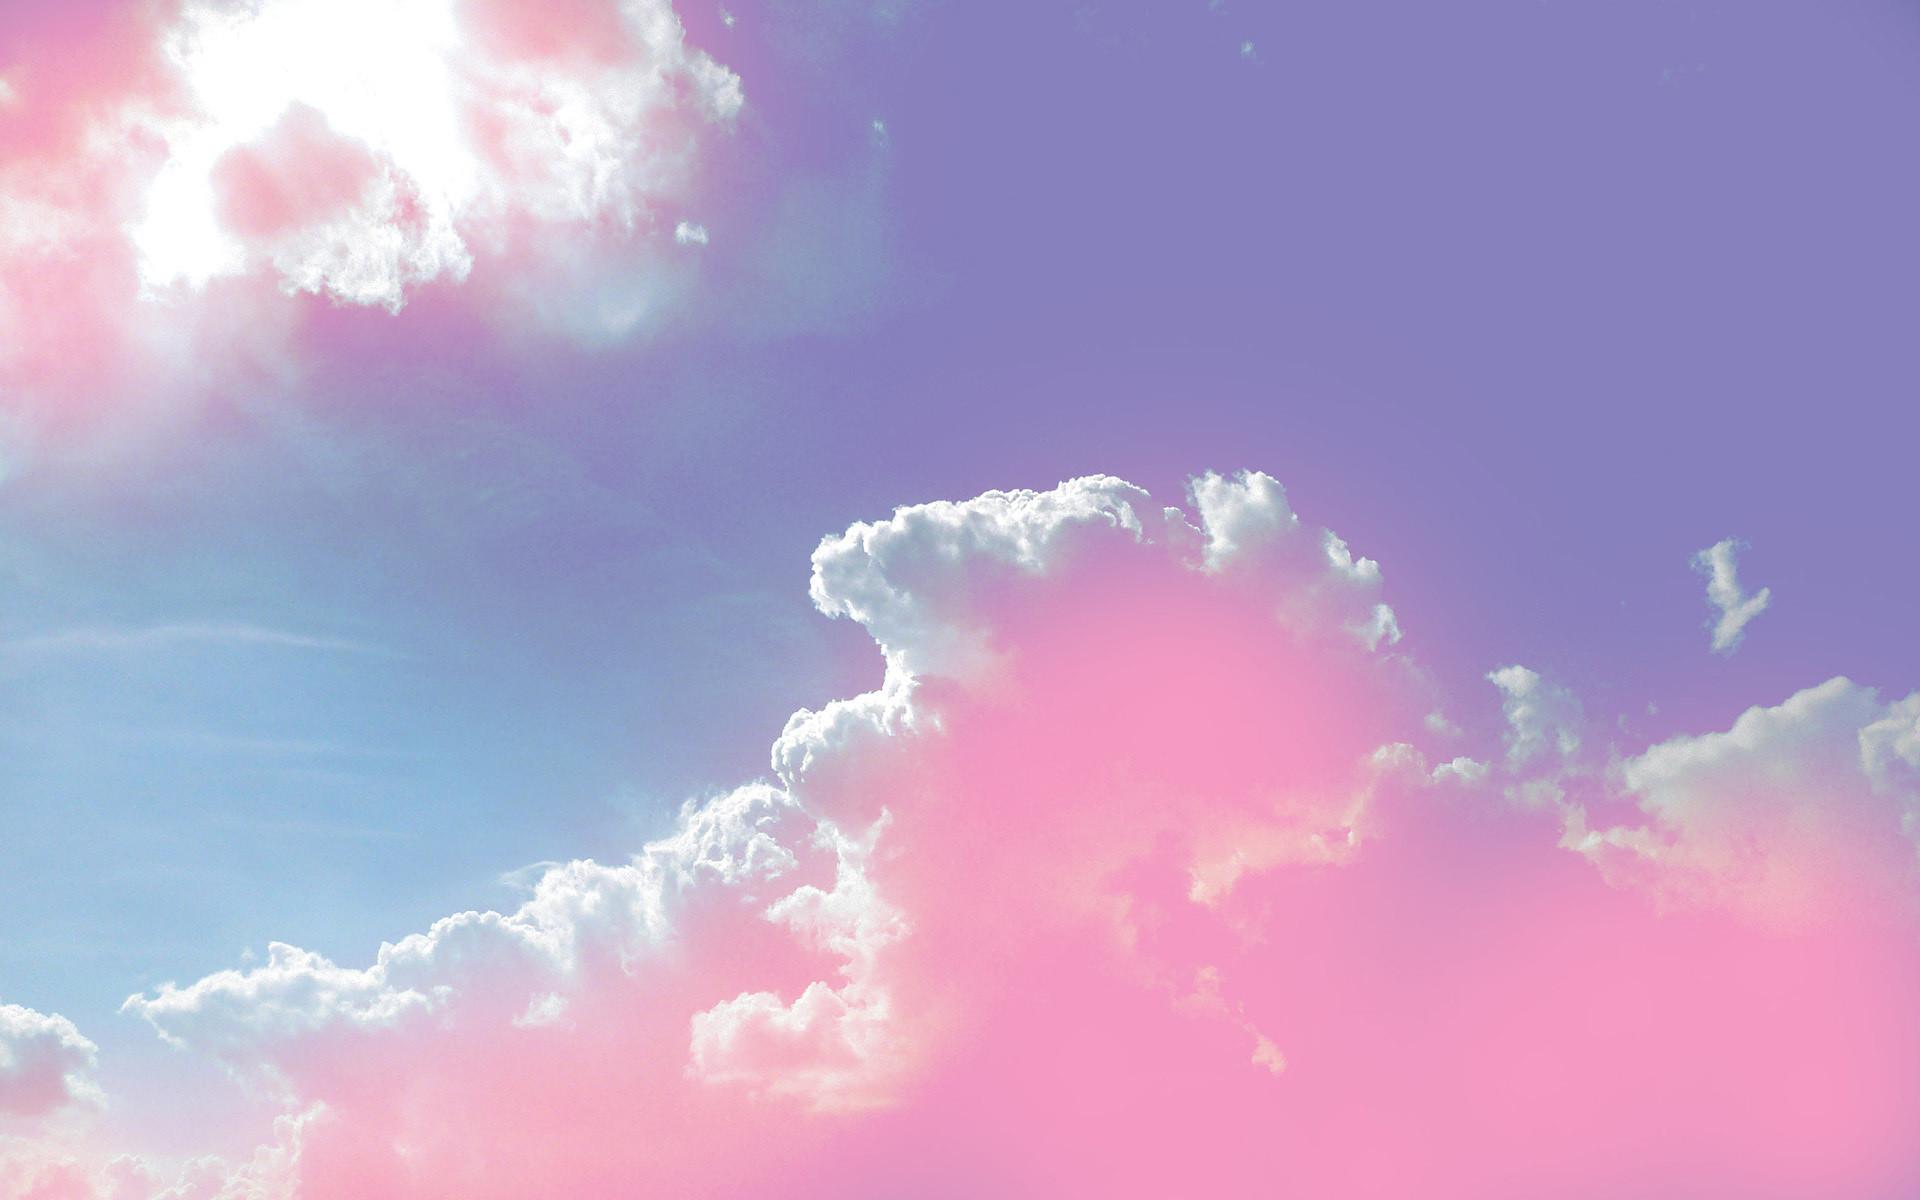 Desktop Sky Backgrounds | Wallpapers, Backgrounds, Images, Art Photos.